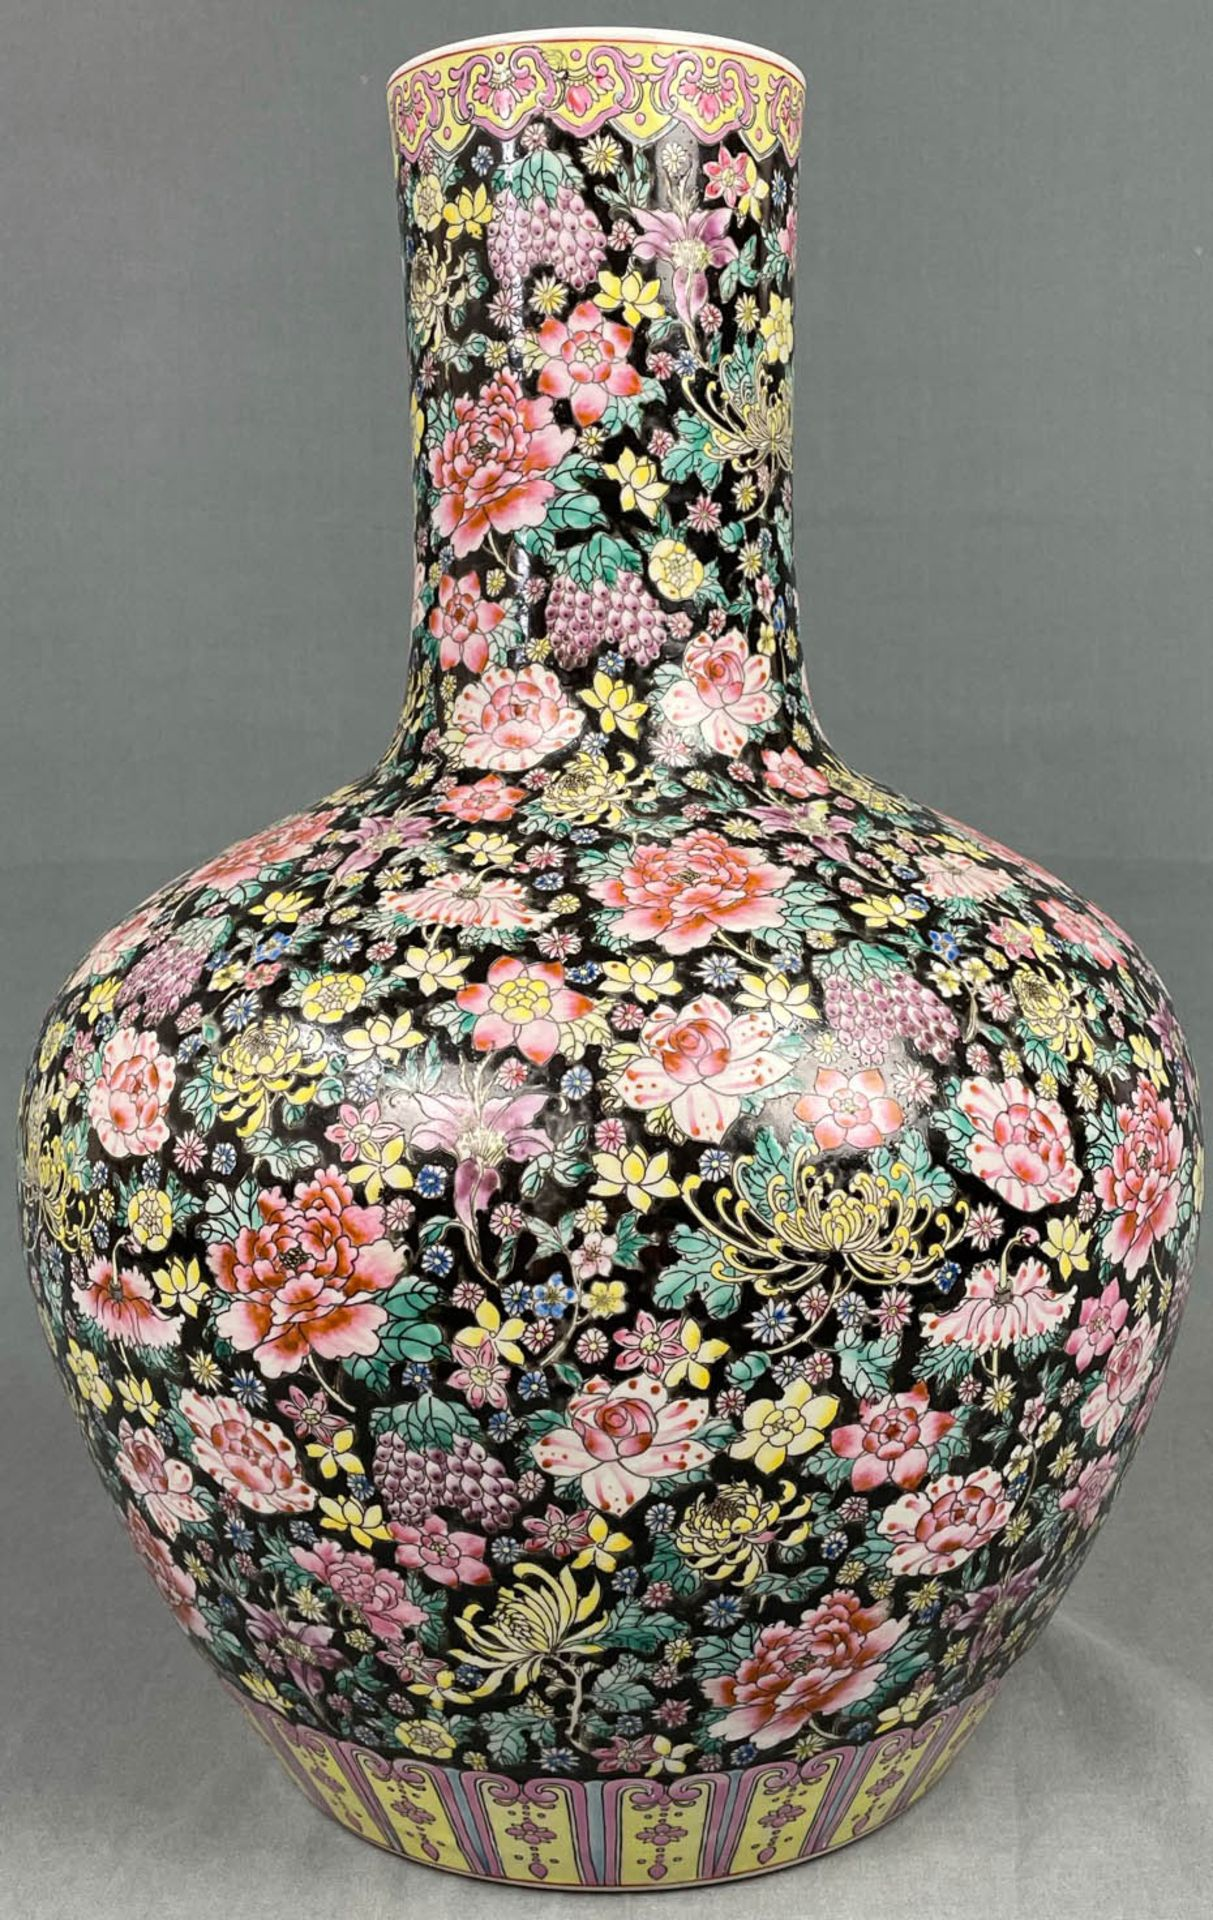 China. Porzellan. Vase. Stempelmarke circa 1930 - 1950. 53 cm hoch. - Image 3 of 20